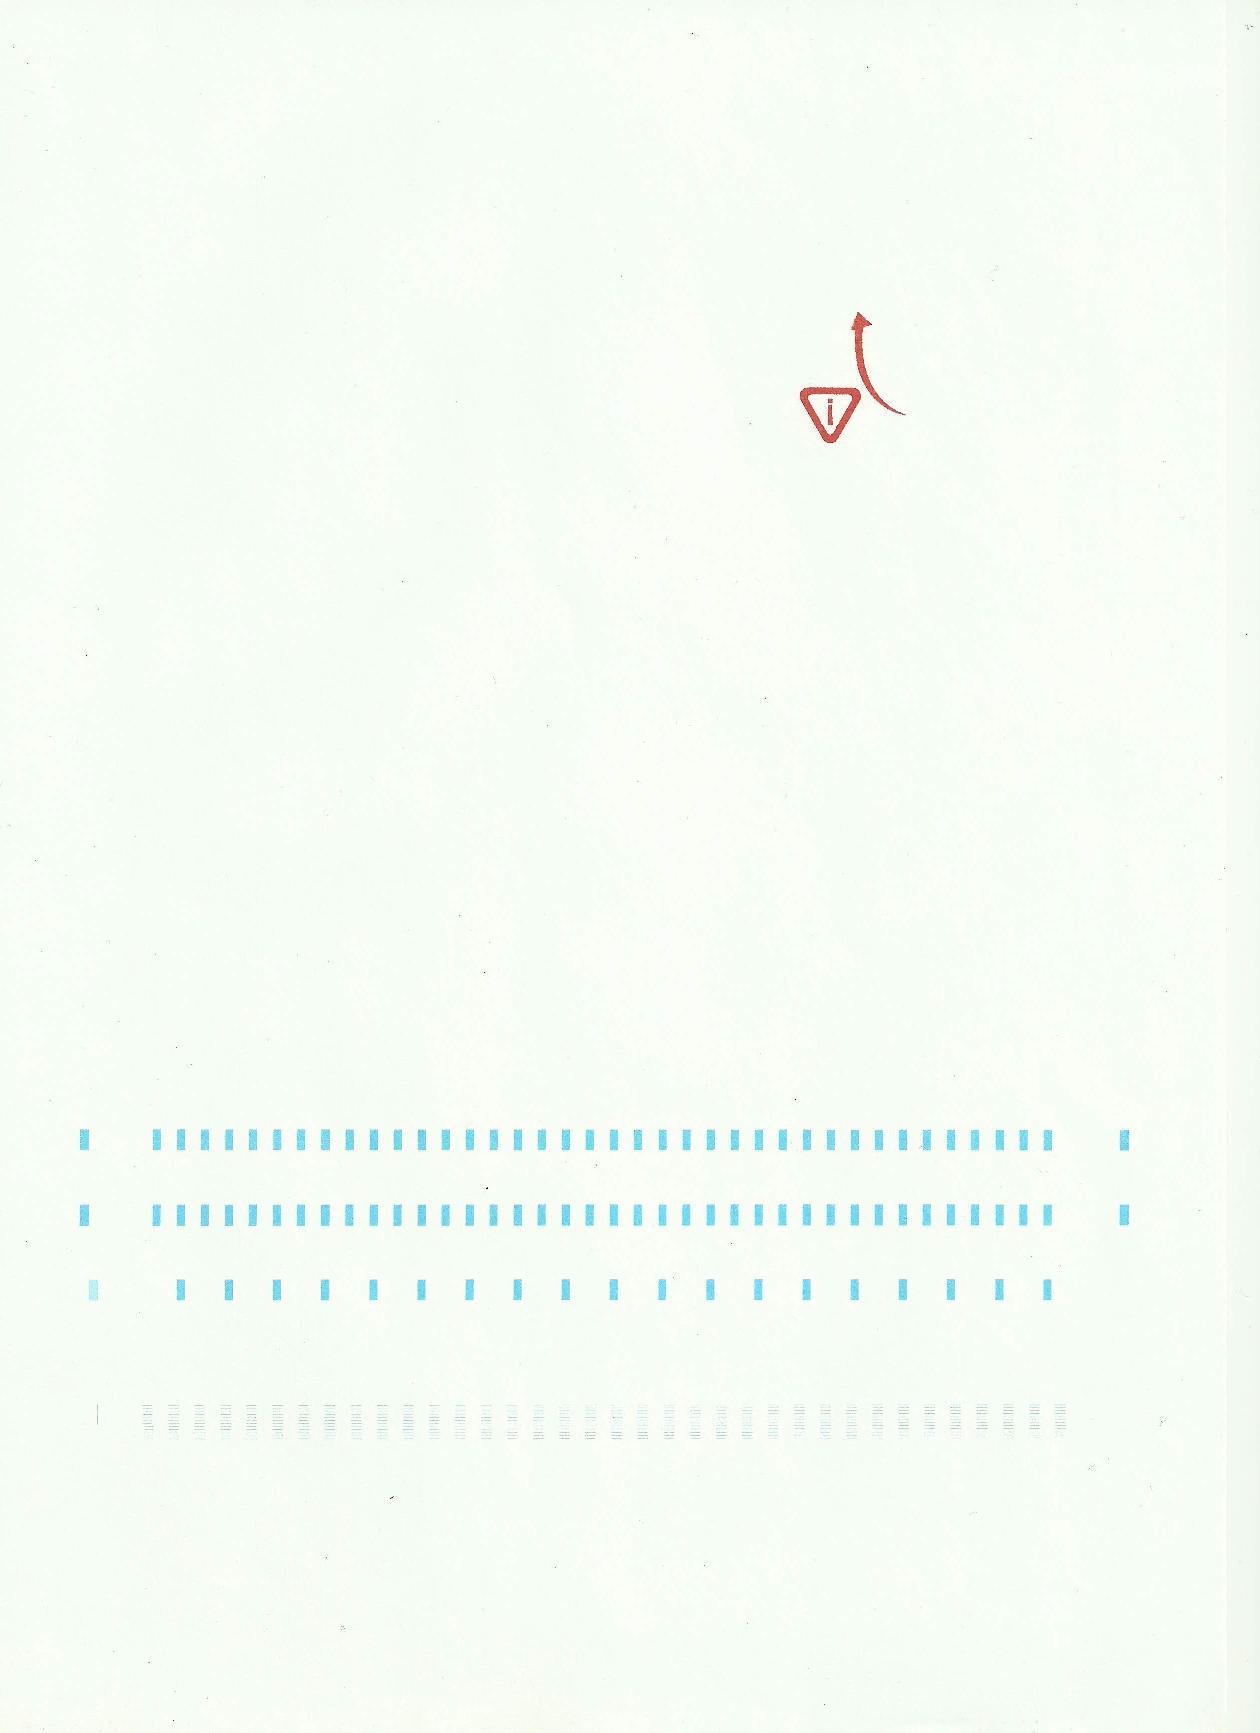 escanear0001-page-001.jpg